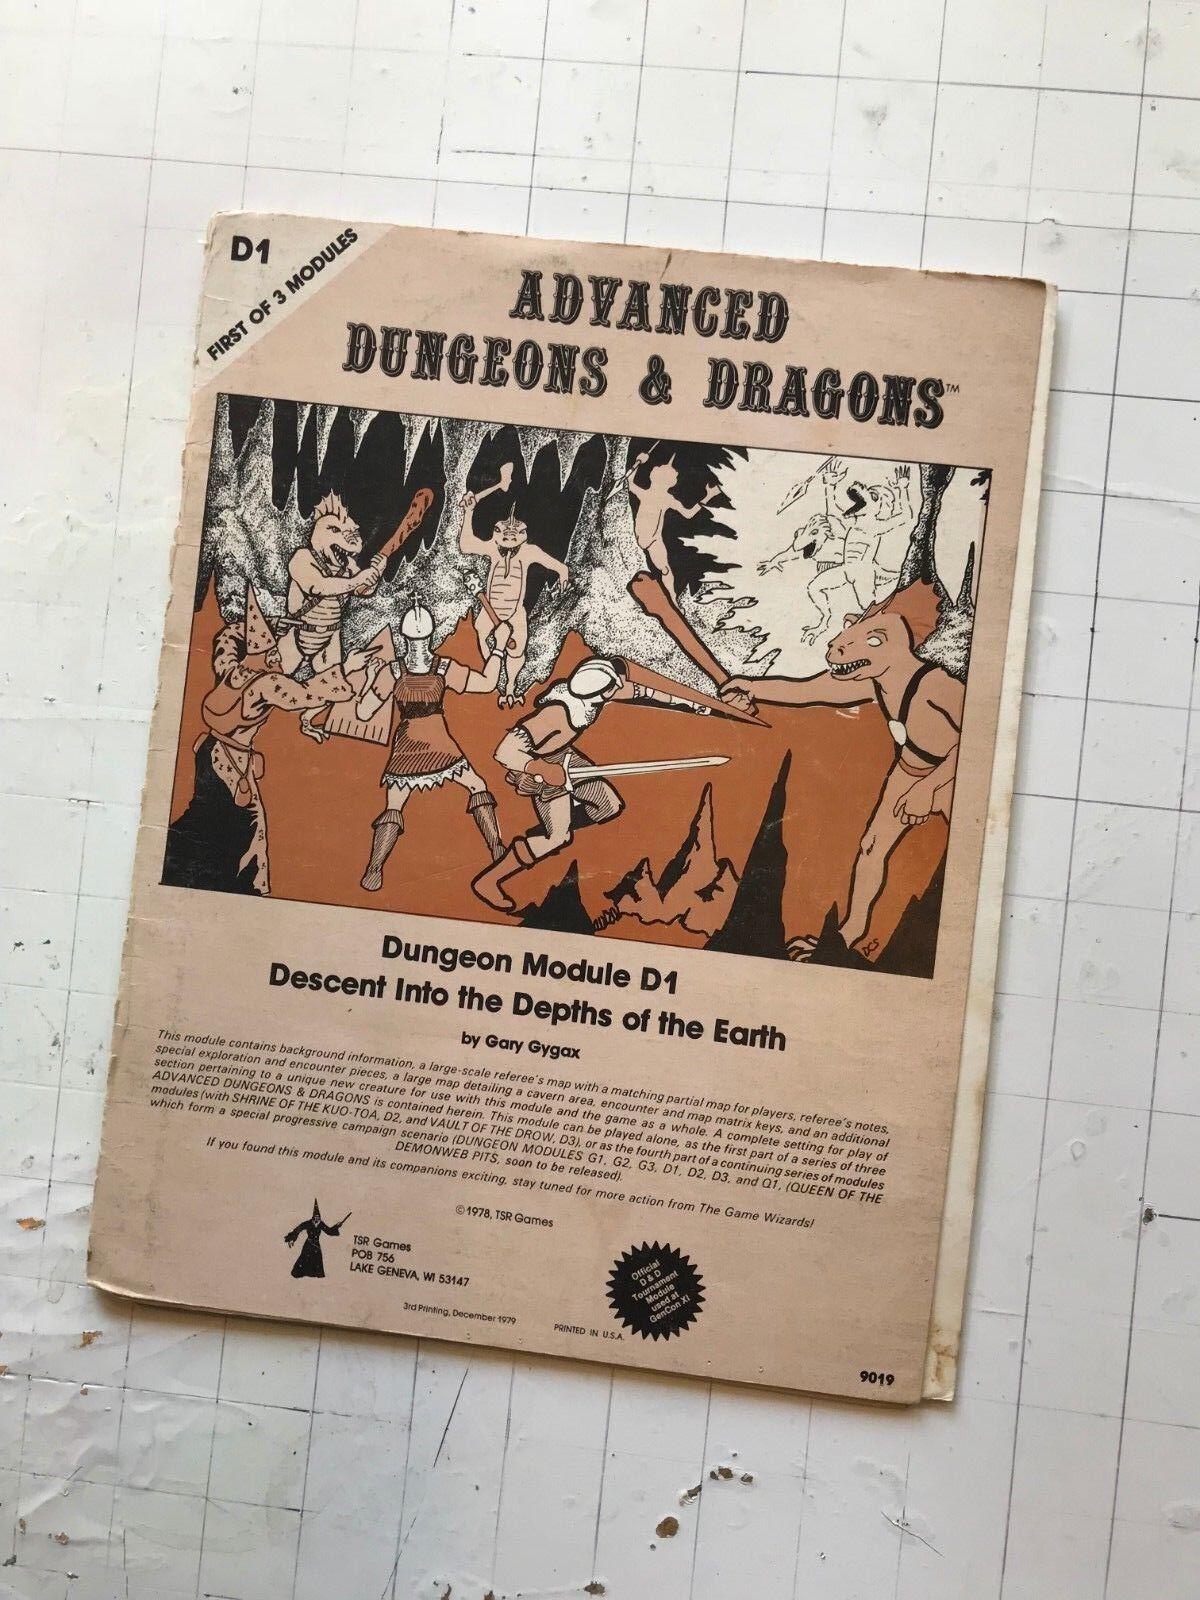 1979 TSR AD&D D1 DESCENT into DEPTHS of the EARTH MODULE 9019 3RD D&D gygax gary